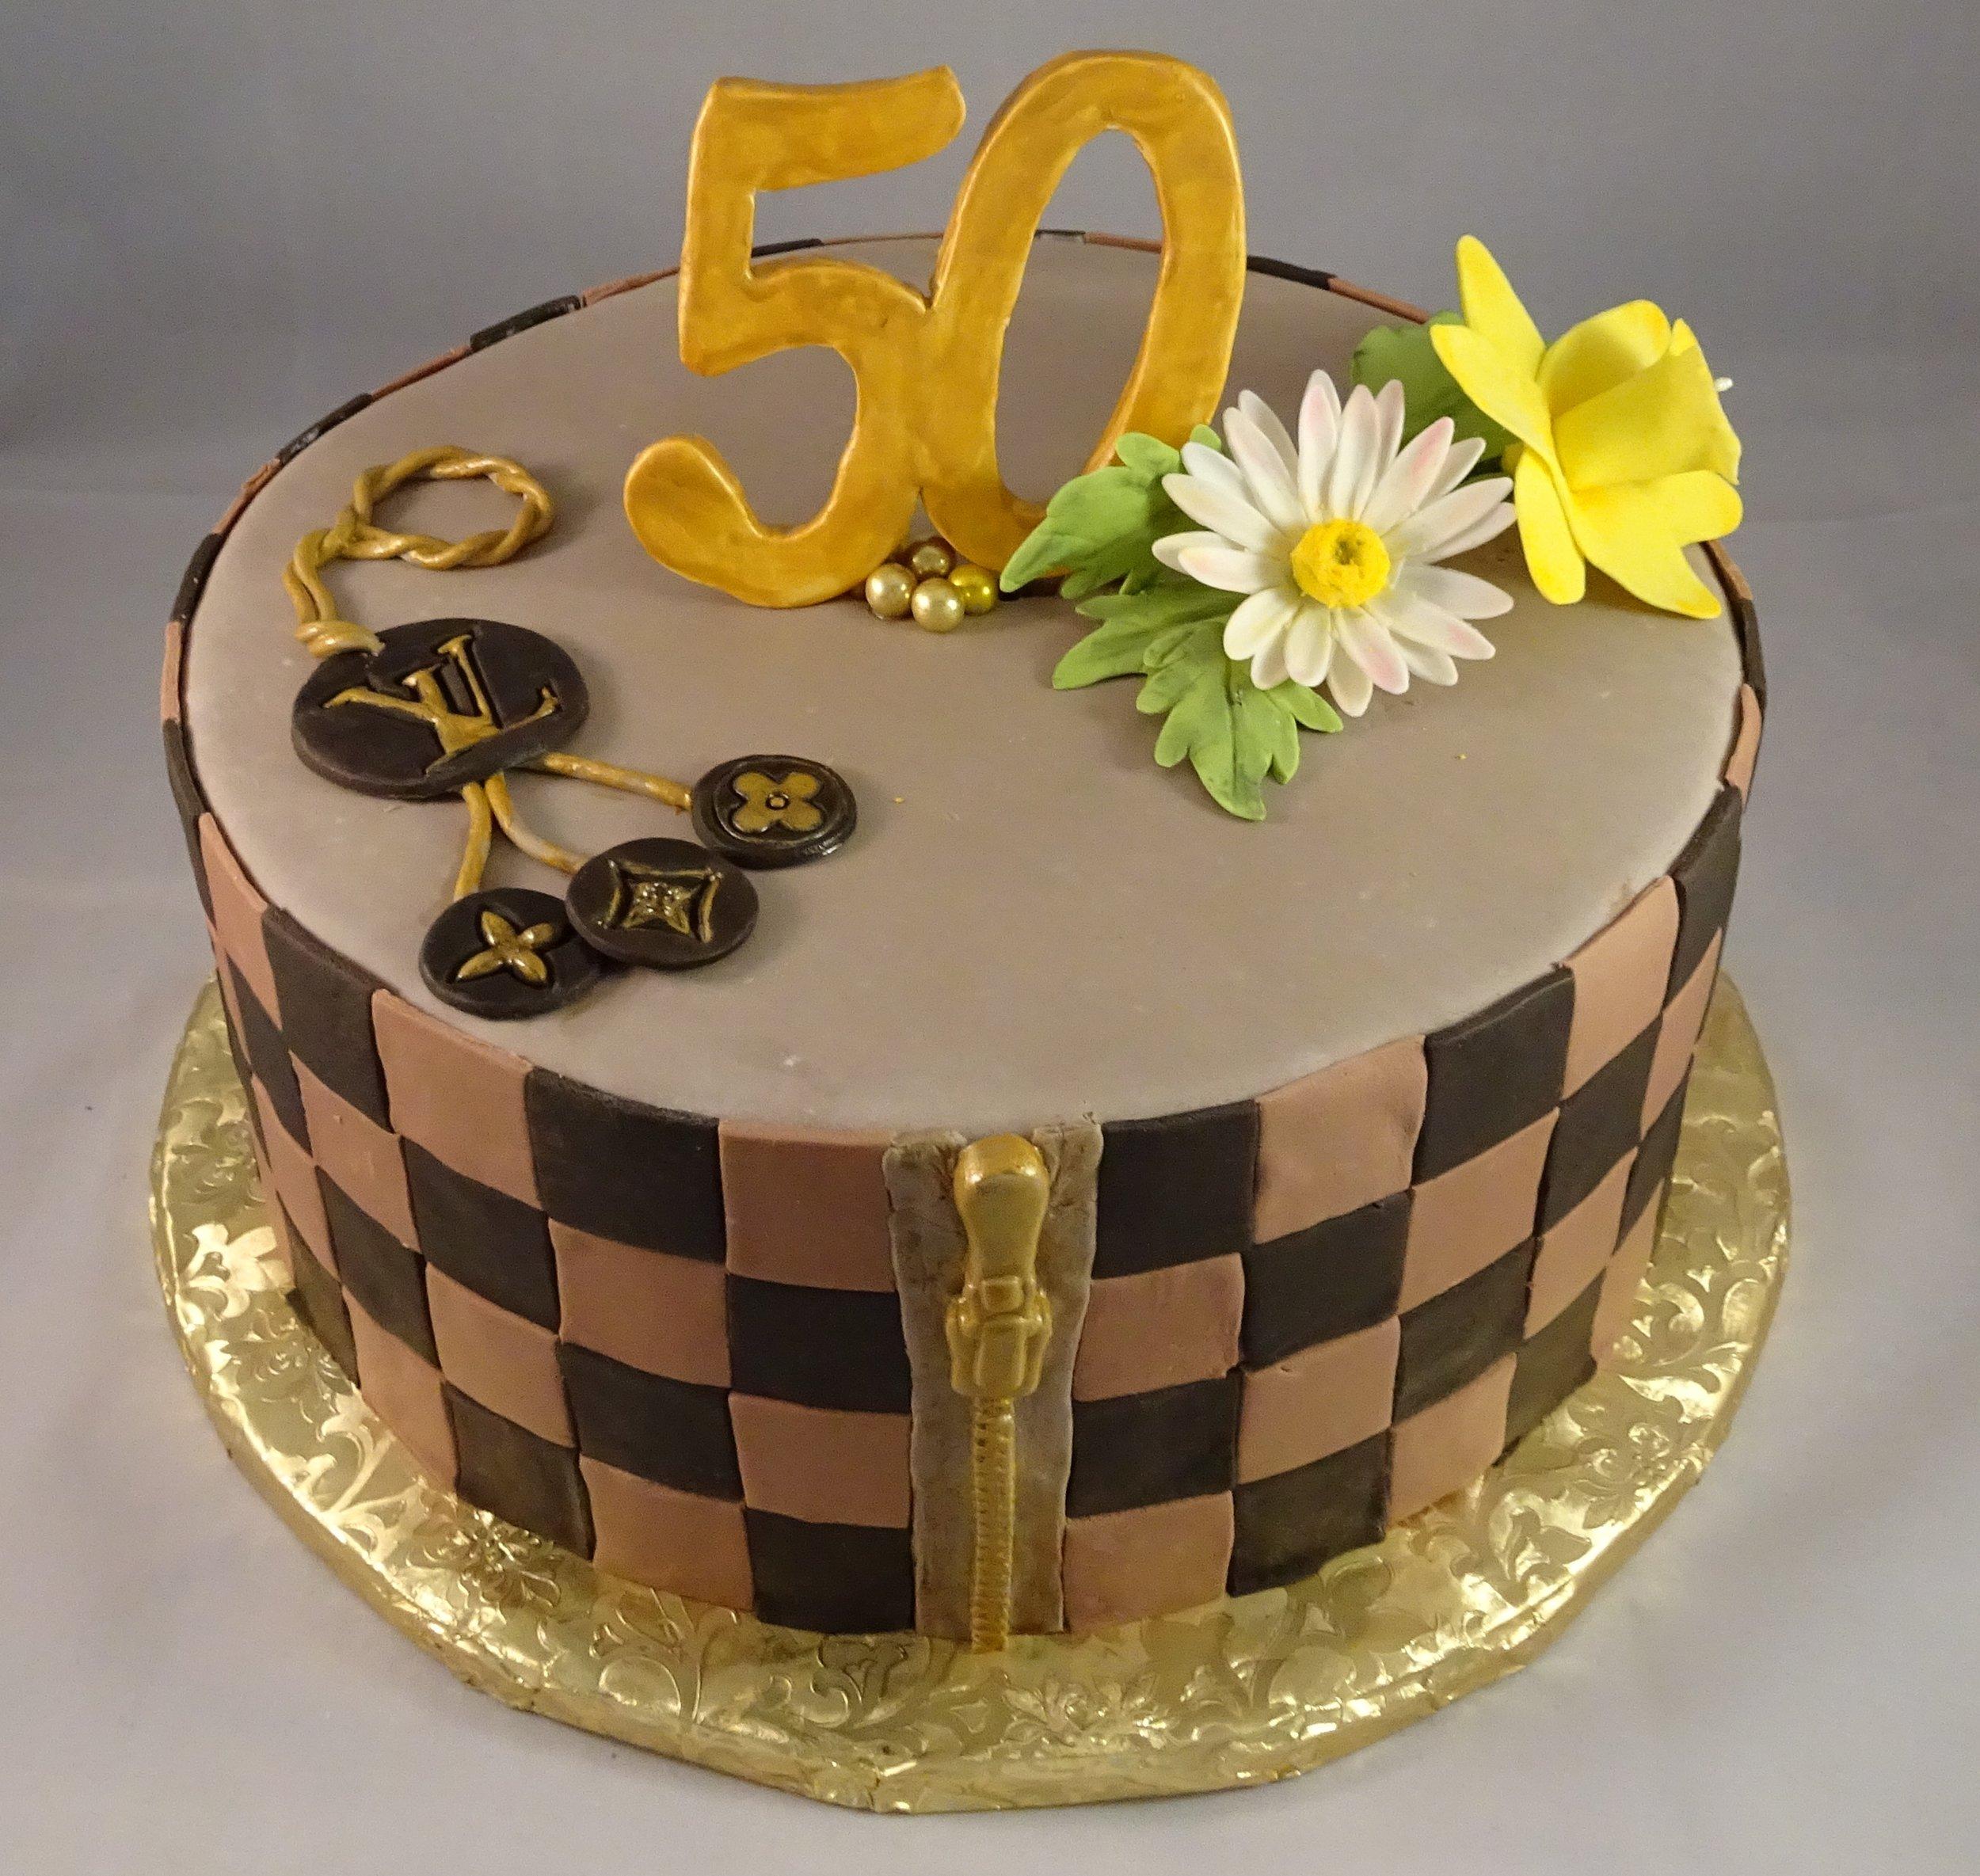 Cake Louis Vuitton.JPG